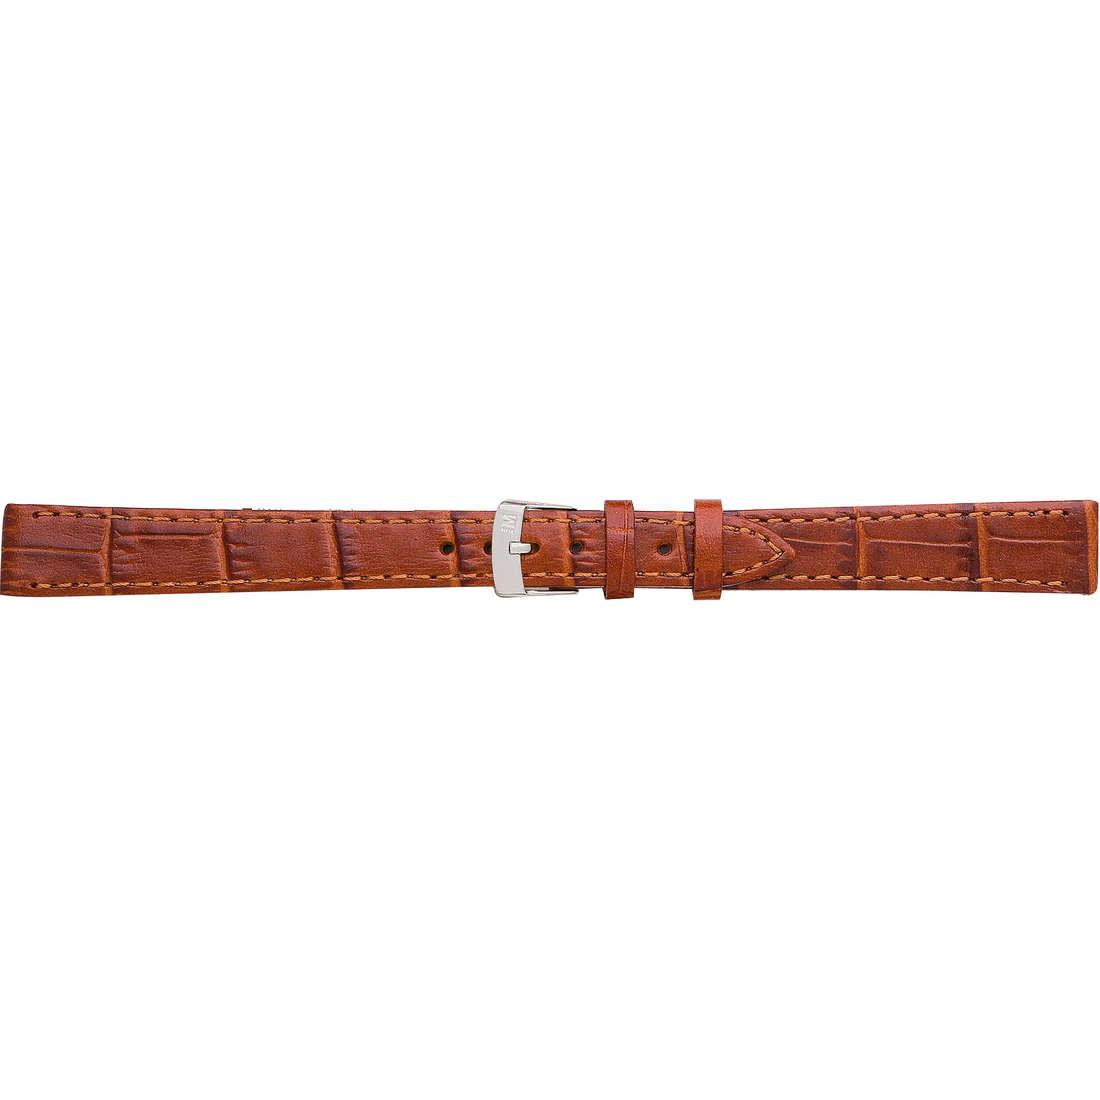 watch watch bands watch straps unisex Morellato I Lunghi A01Y2524656041CR20